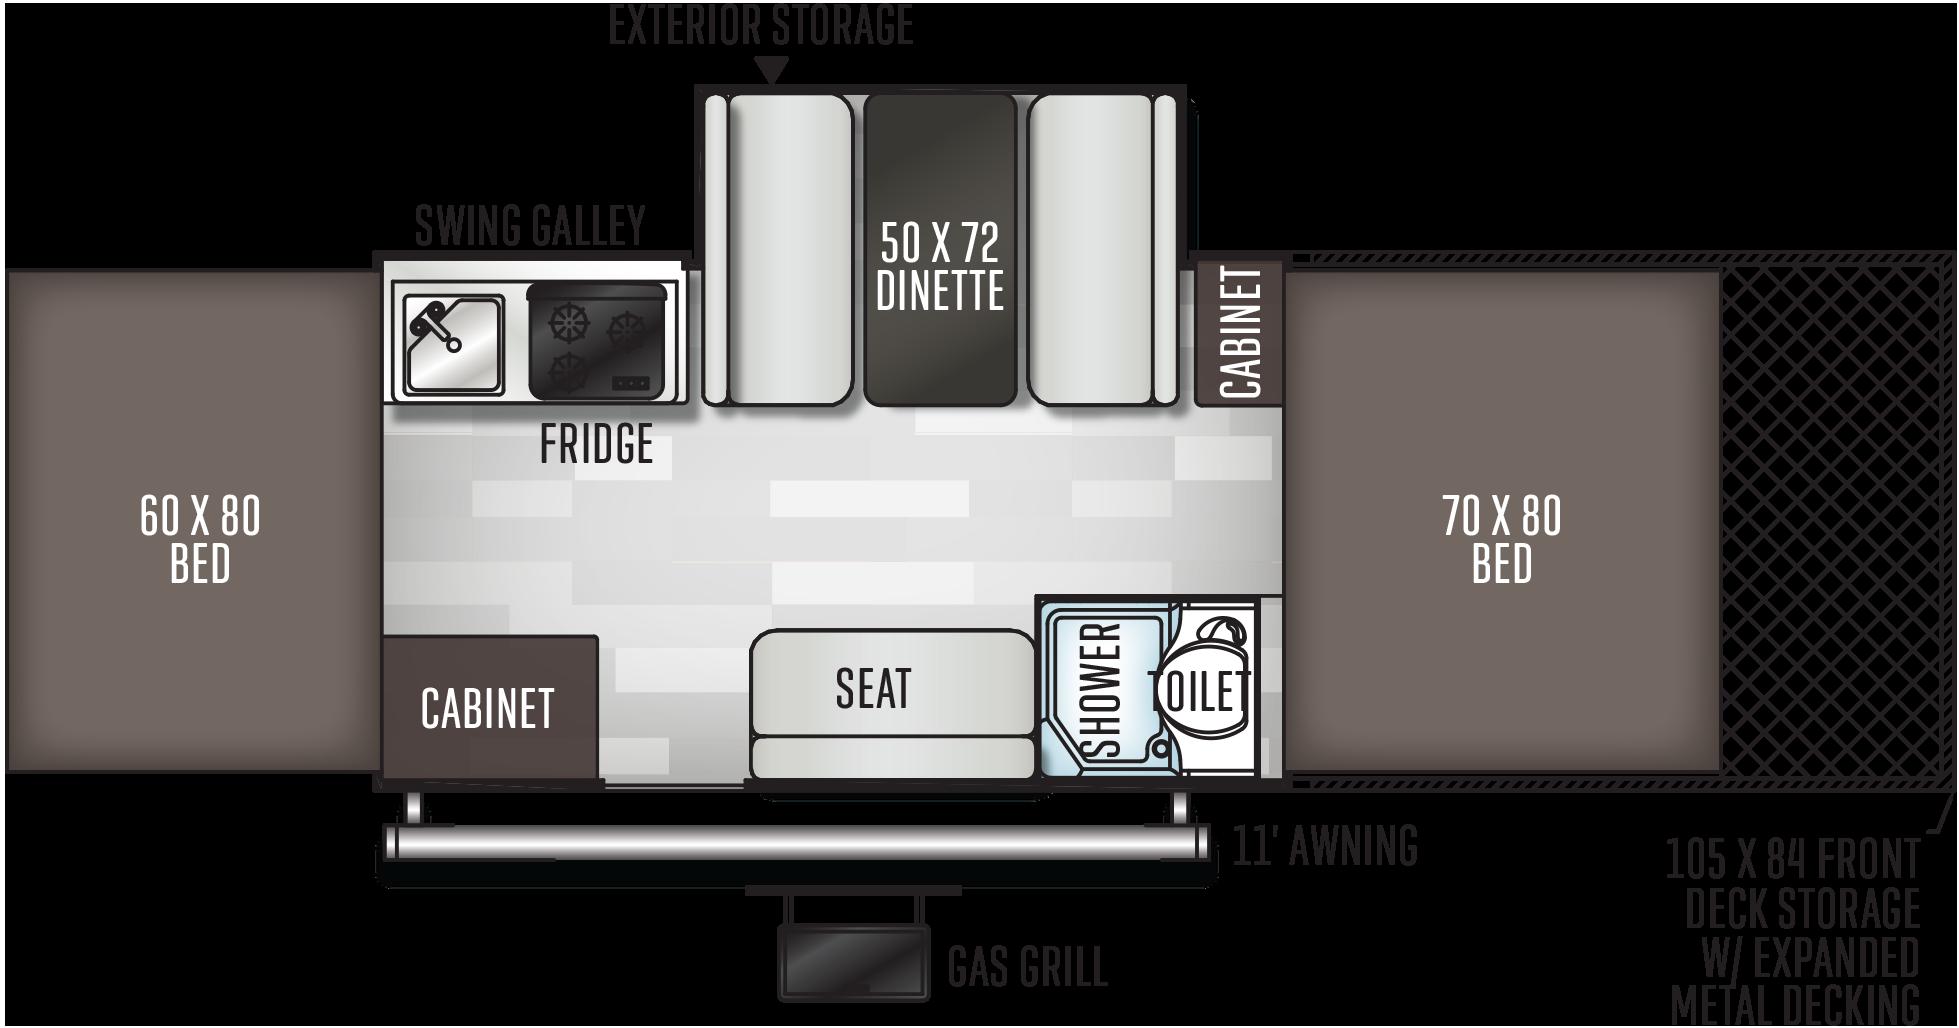 28tscse Floorplan